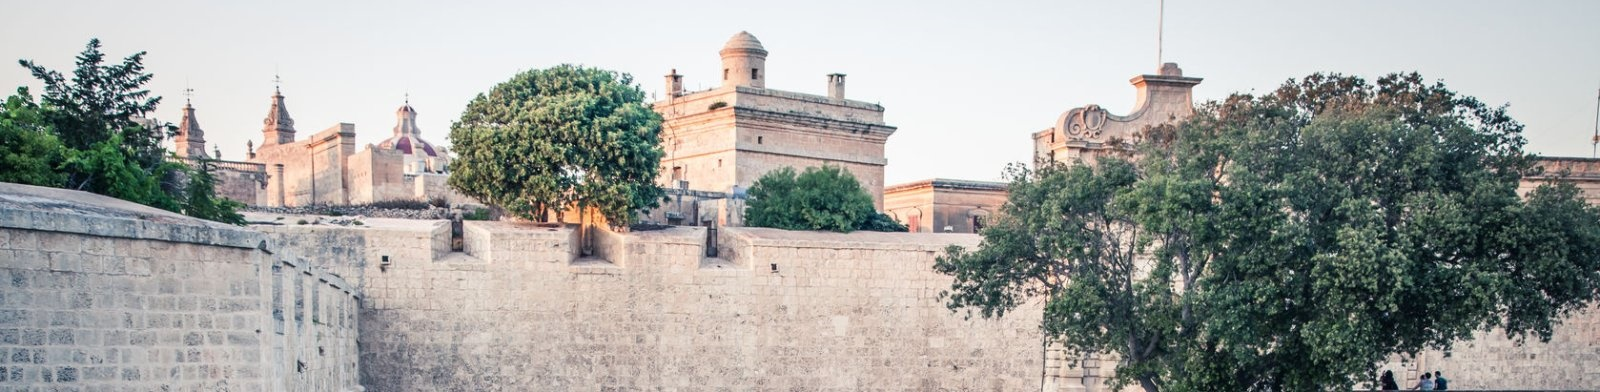 Malta, Main Image